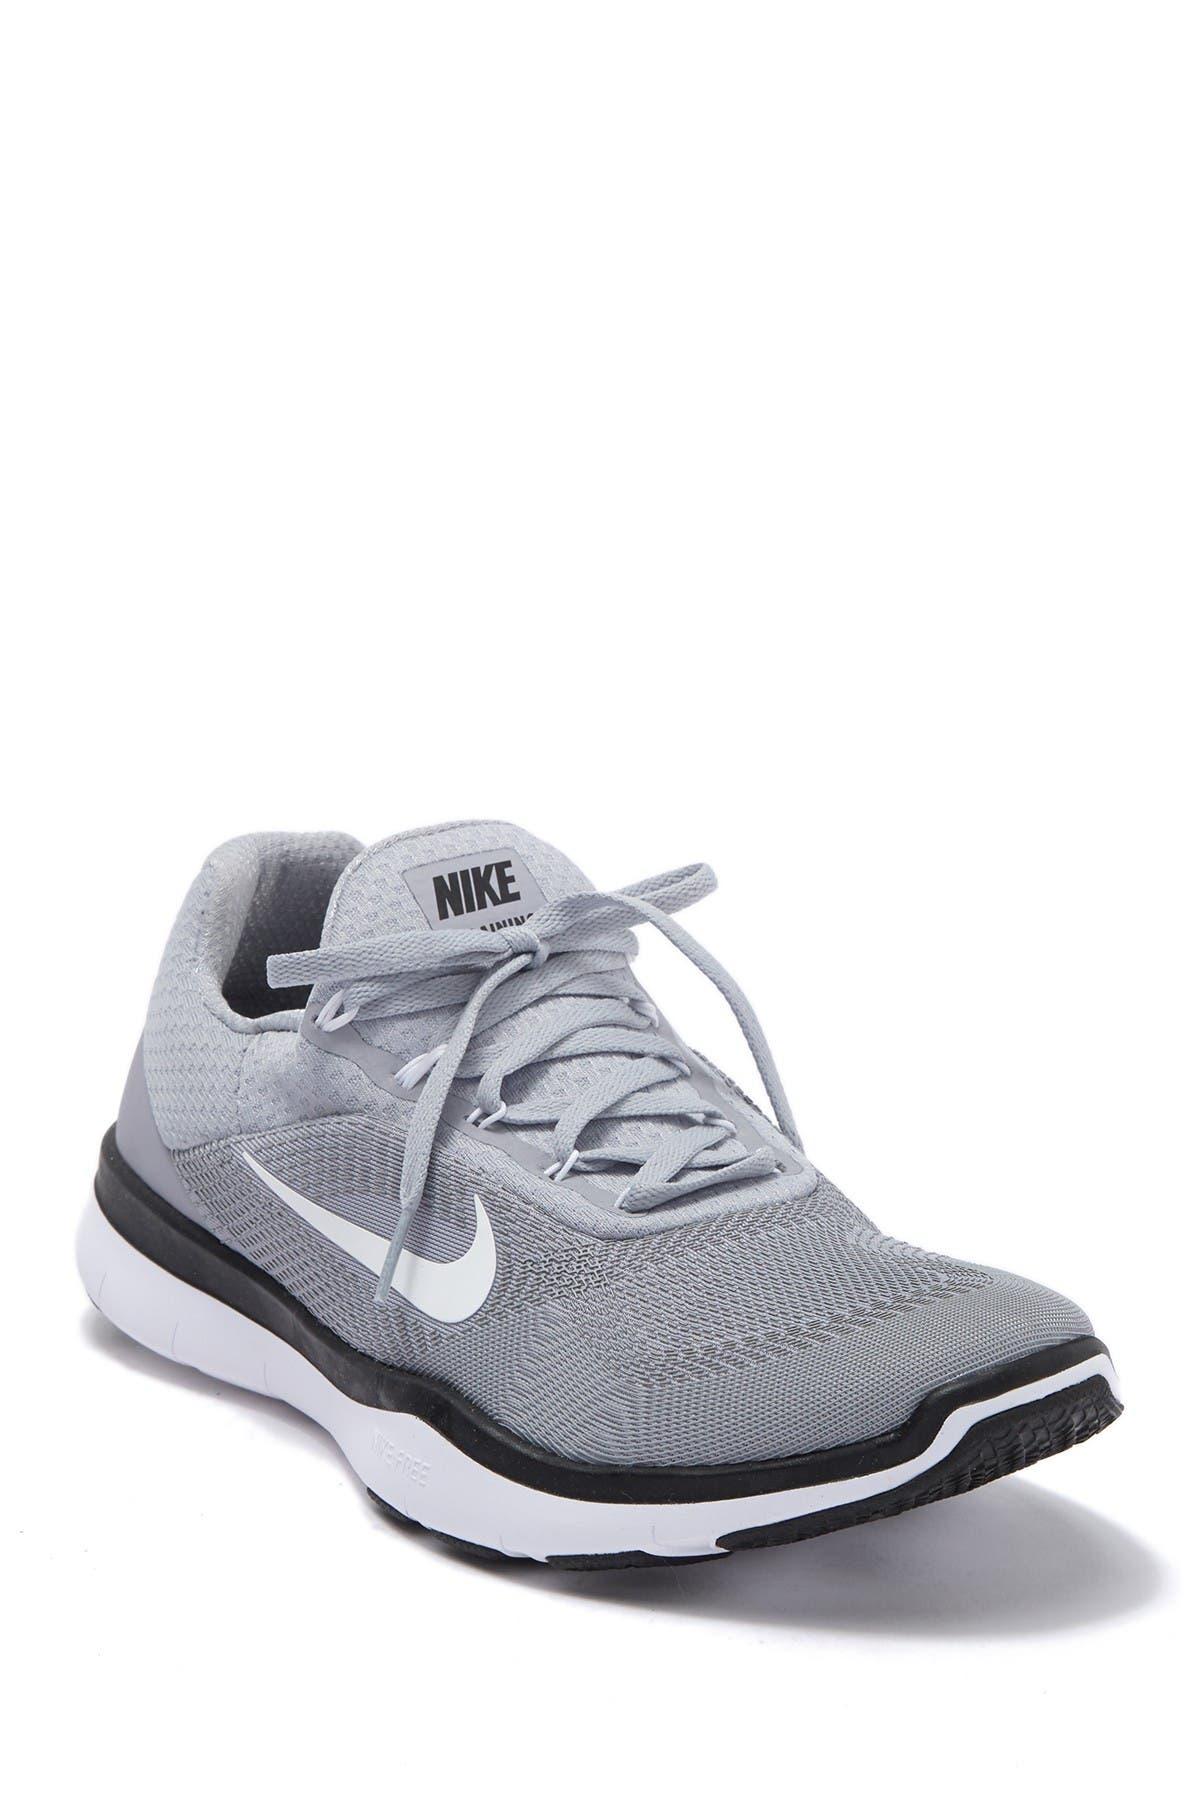 Nike | Free Trainer V7 TB Sneaker